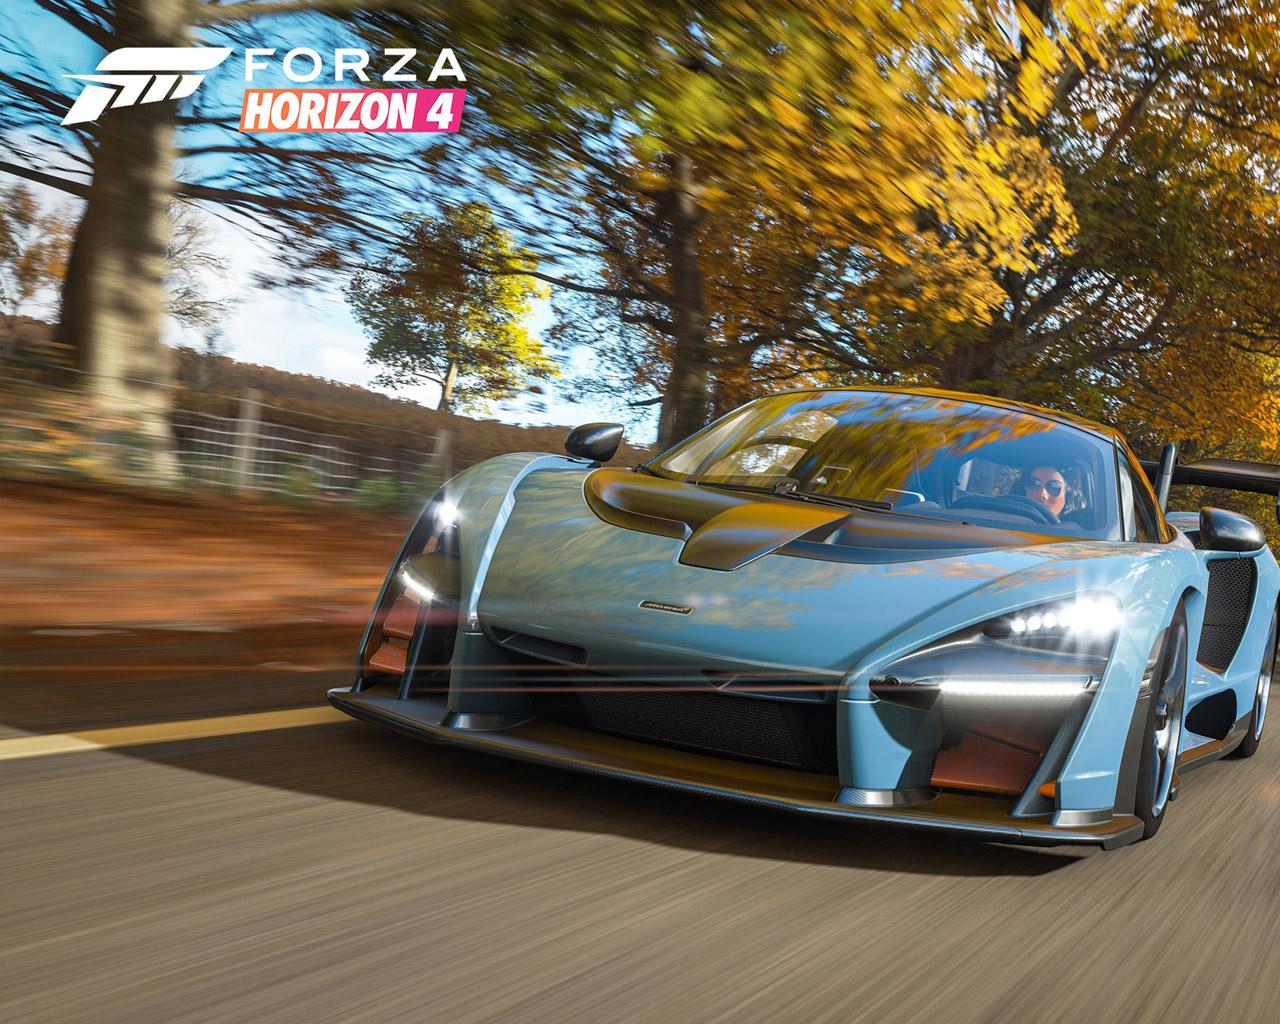 Free Forza Horizon 4 Wallpaper in 1280x1024